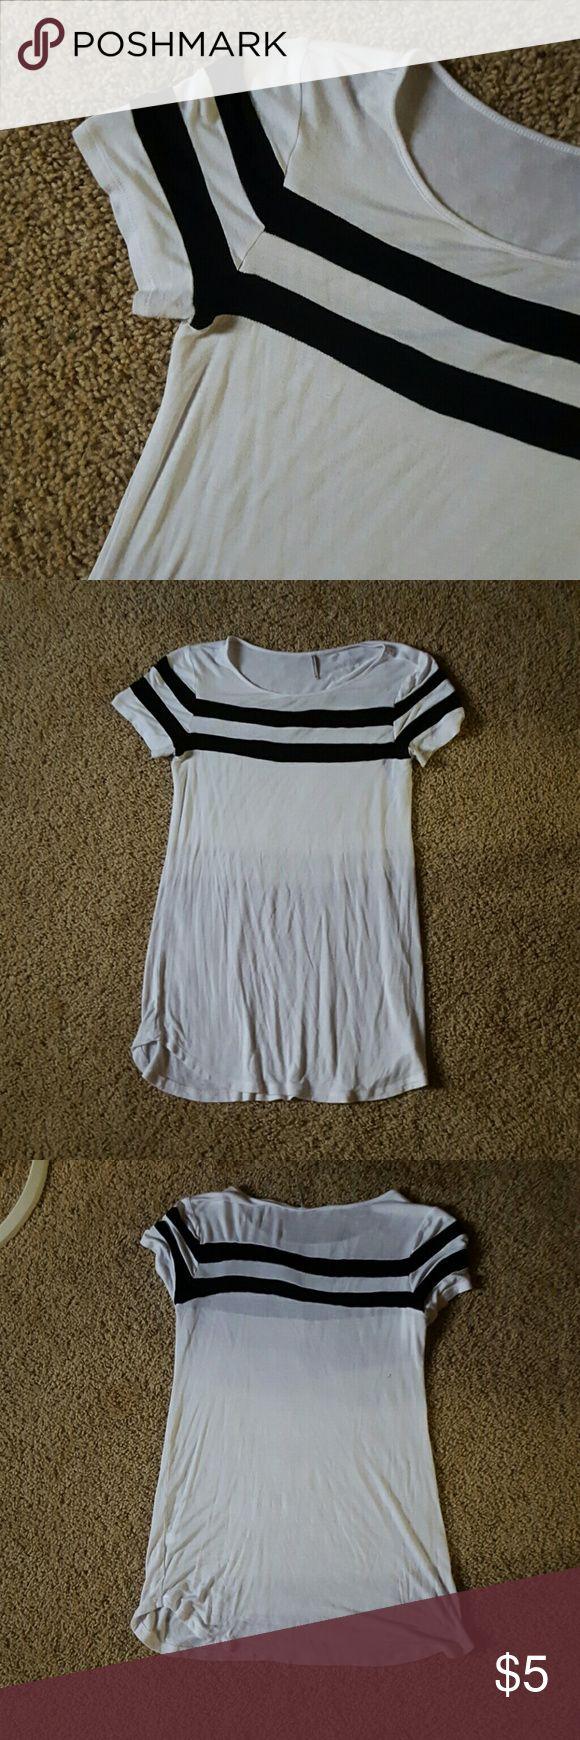 Striped short sleeved top Long striped short sleeved t-shirt tresics Tops Tees - Short Sleeve